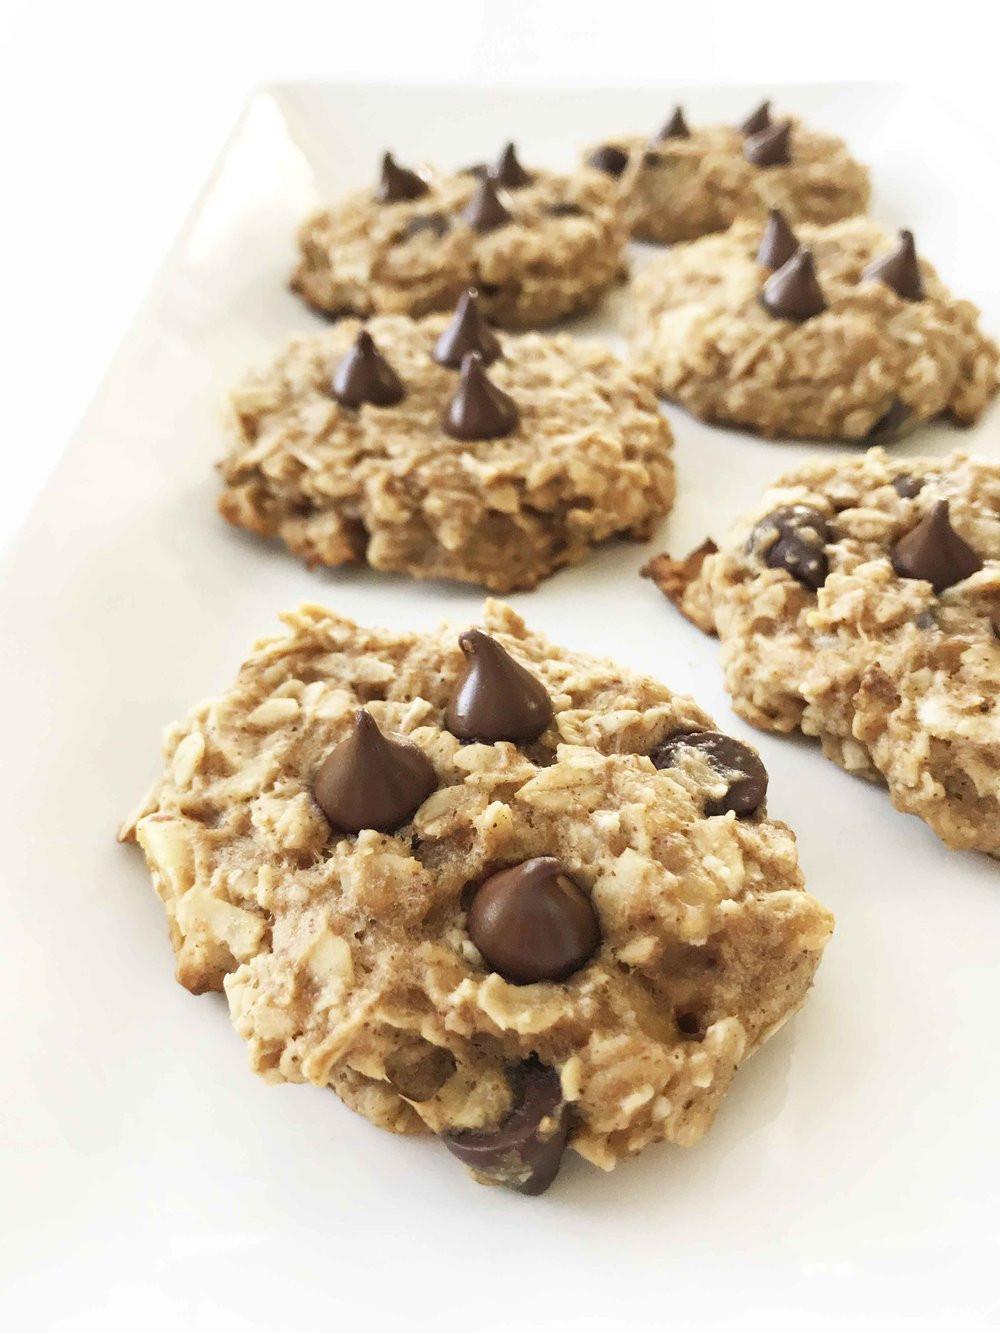 Healthy Peanut Butter Banana Oatmeal Cookies  Healthy Peanut Butter Oatmeal Cookies — The Skinny Fork